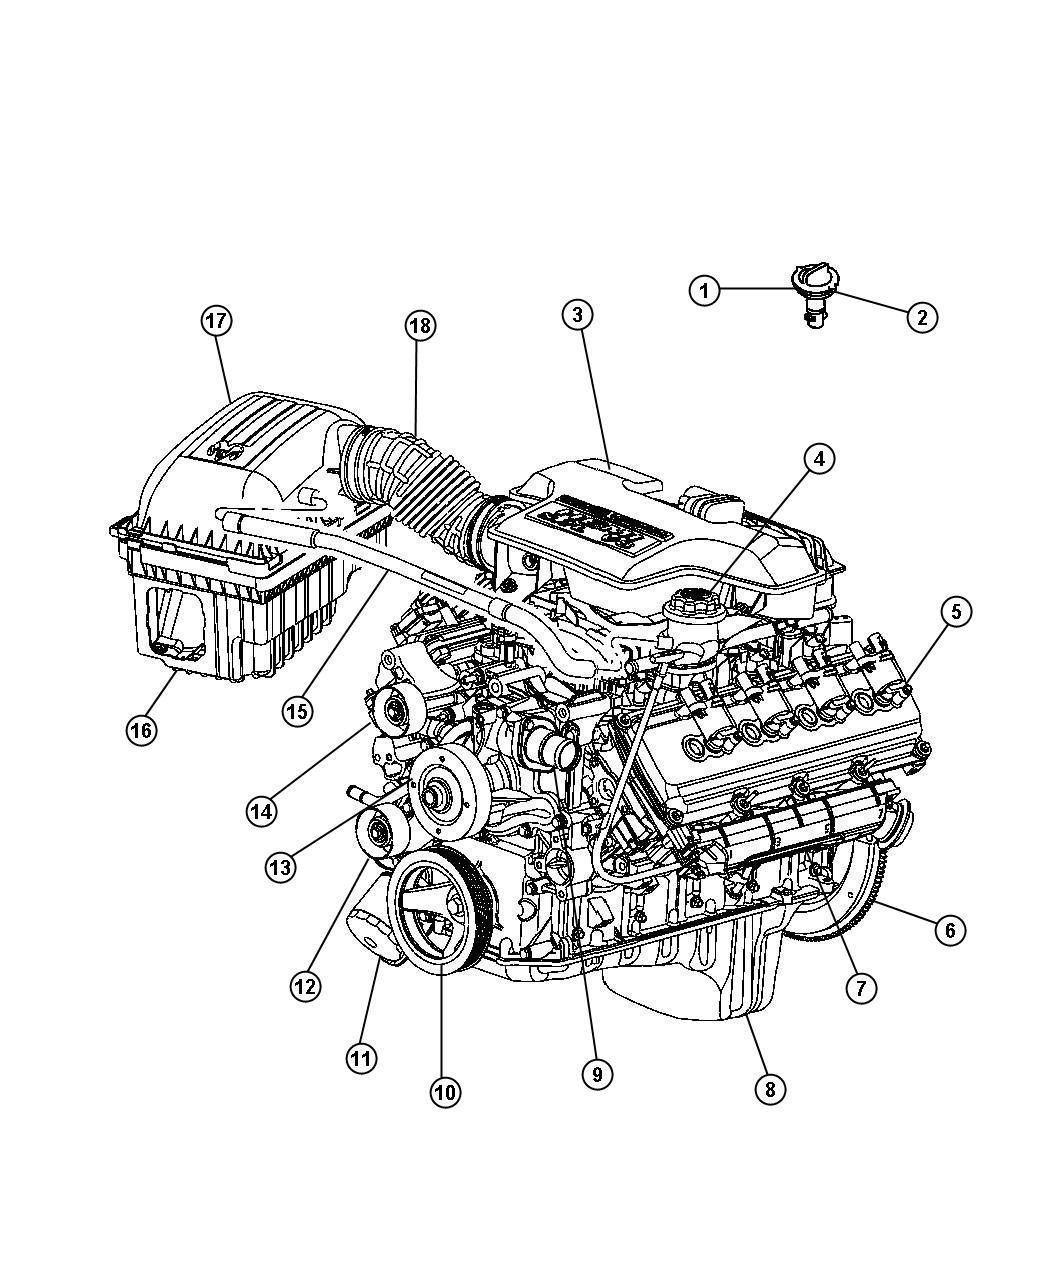 YF_5969] Engine Wiring Diagram 2003 Dodge Ram 2500 Free Image Wiring Diagram  Wiring DiagramHyedi Gresi Magn Papxe Jidig Tobiq Bupi Bletu Ndine Remca Trofu Funi Sarc  Exxlu Umng Mohammedshrine Librar Wiring 101